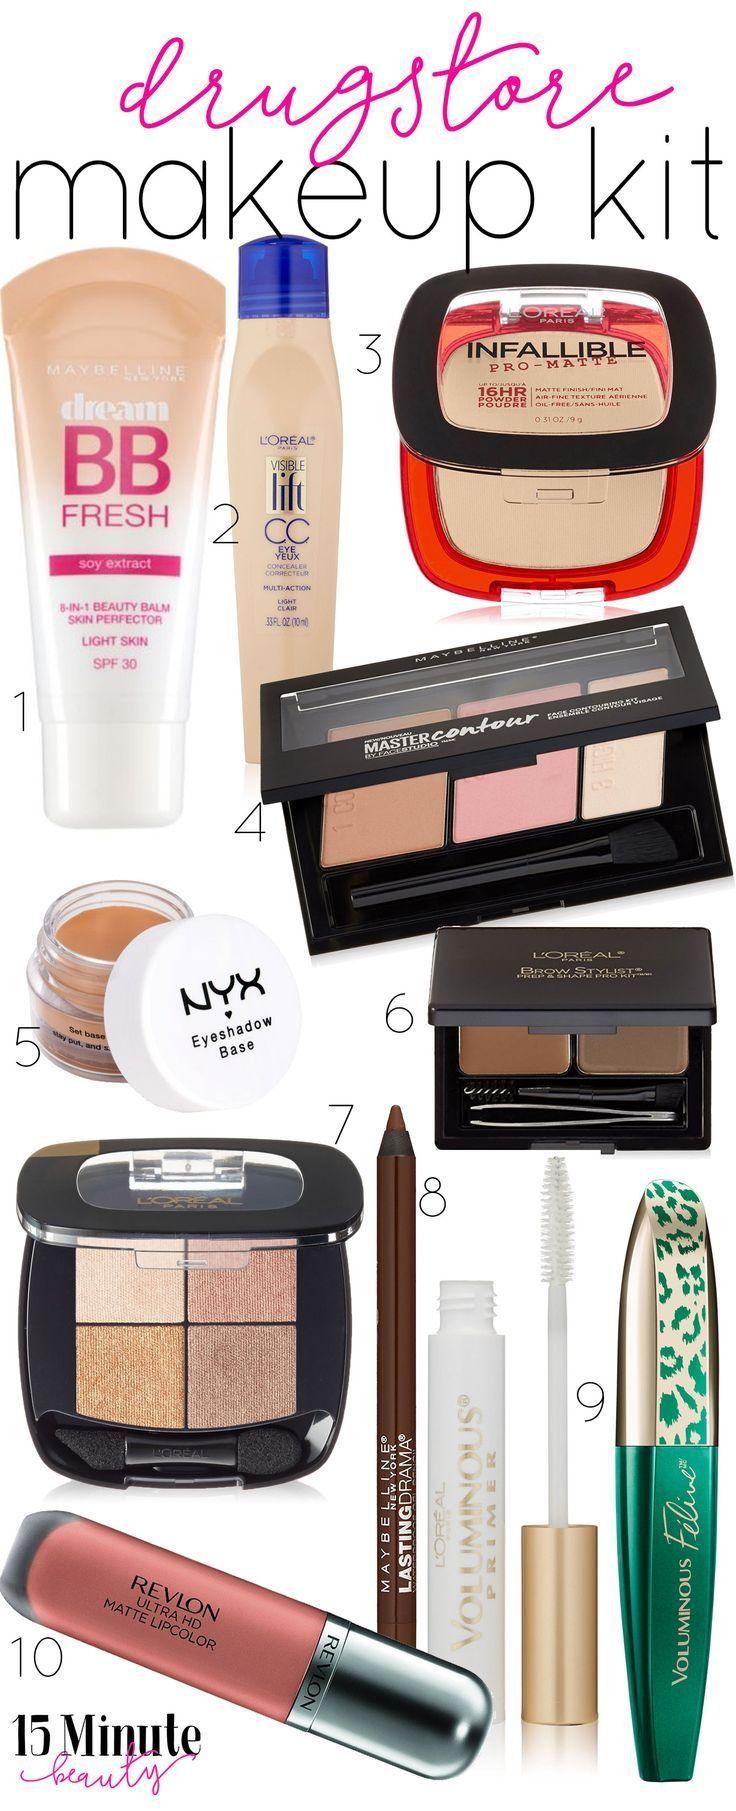 Makeup Kit: 25+ Best Ideas About Basic Makeup Kit On Pinterest